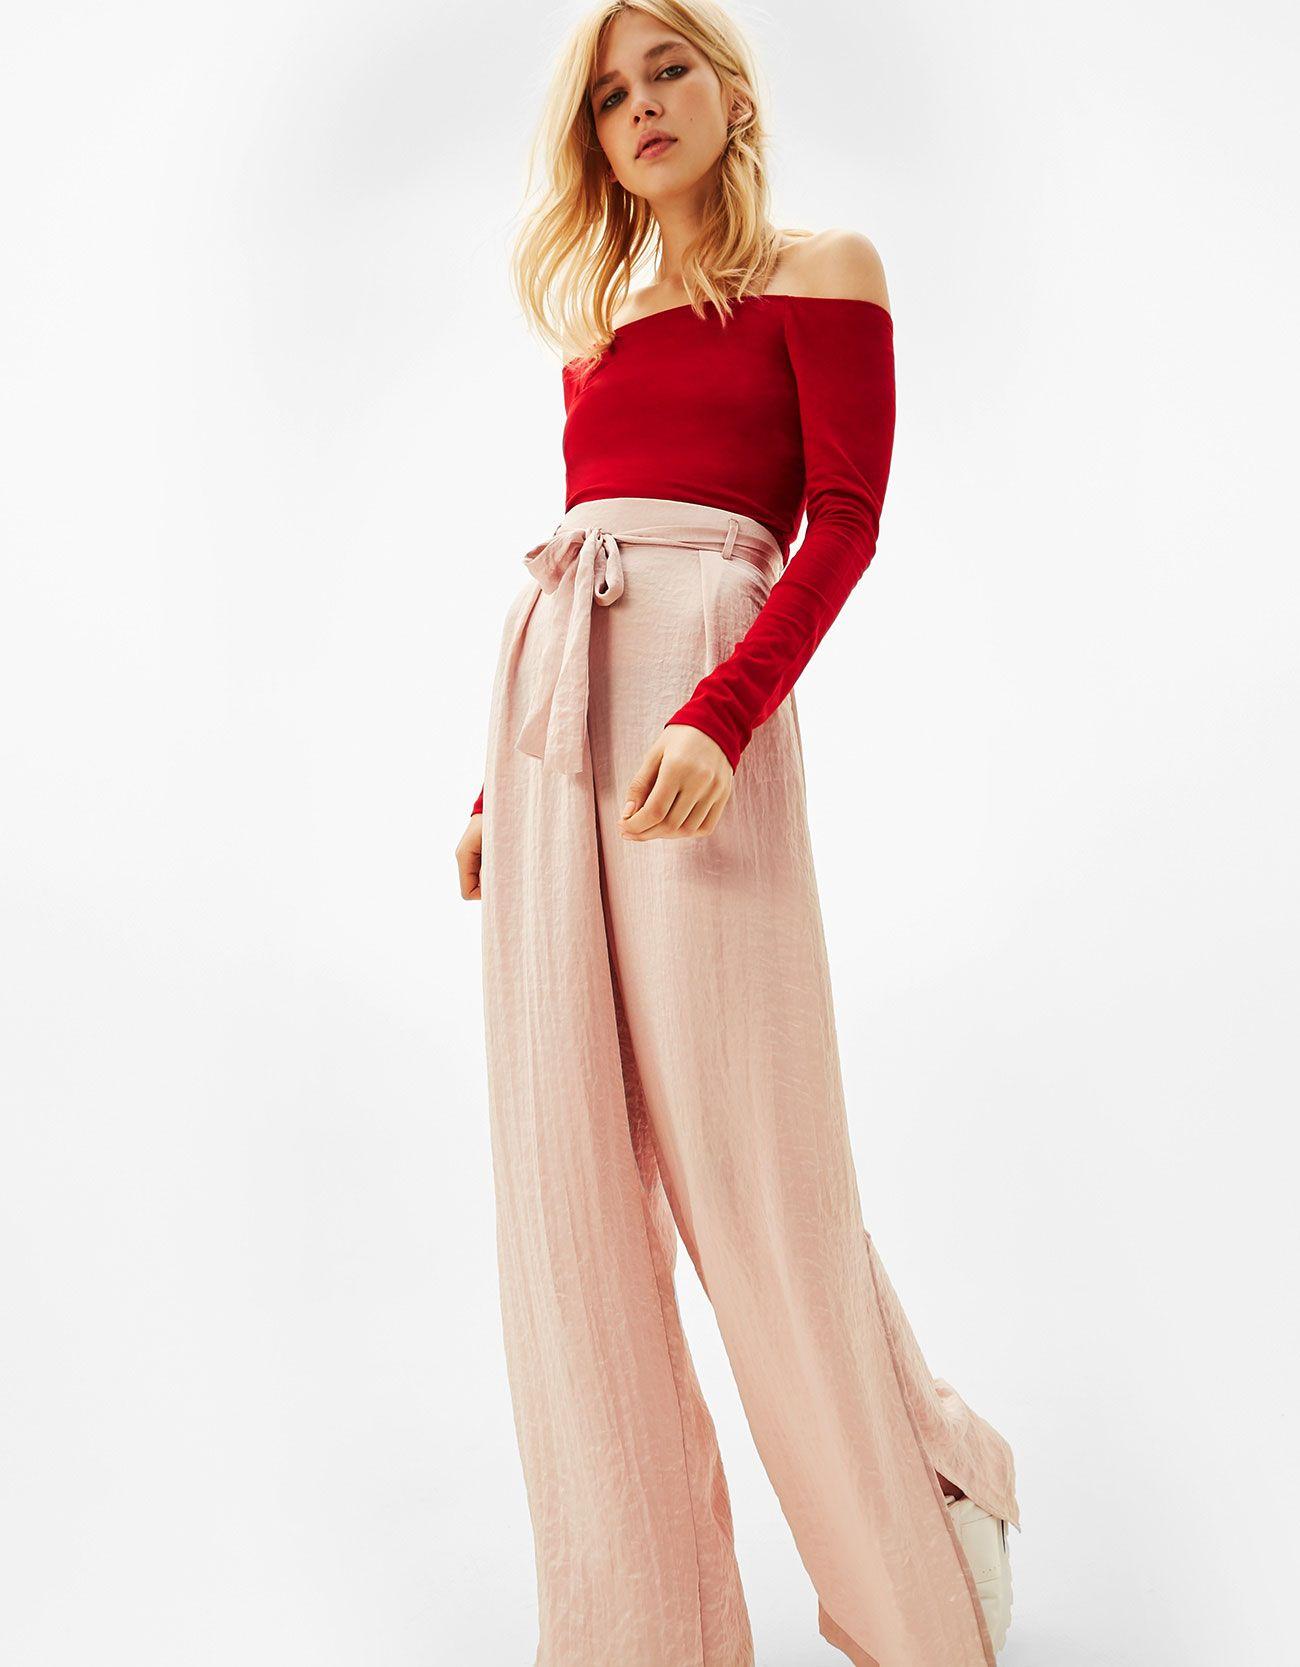 Pantalón ancho satén cinturón. Descubre ésta y muchas otras prendas en  Bershka con nuevos productos cada semana 59017c06ad6e